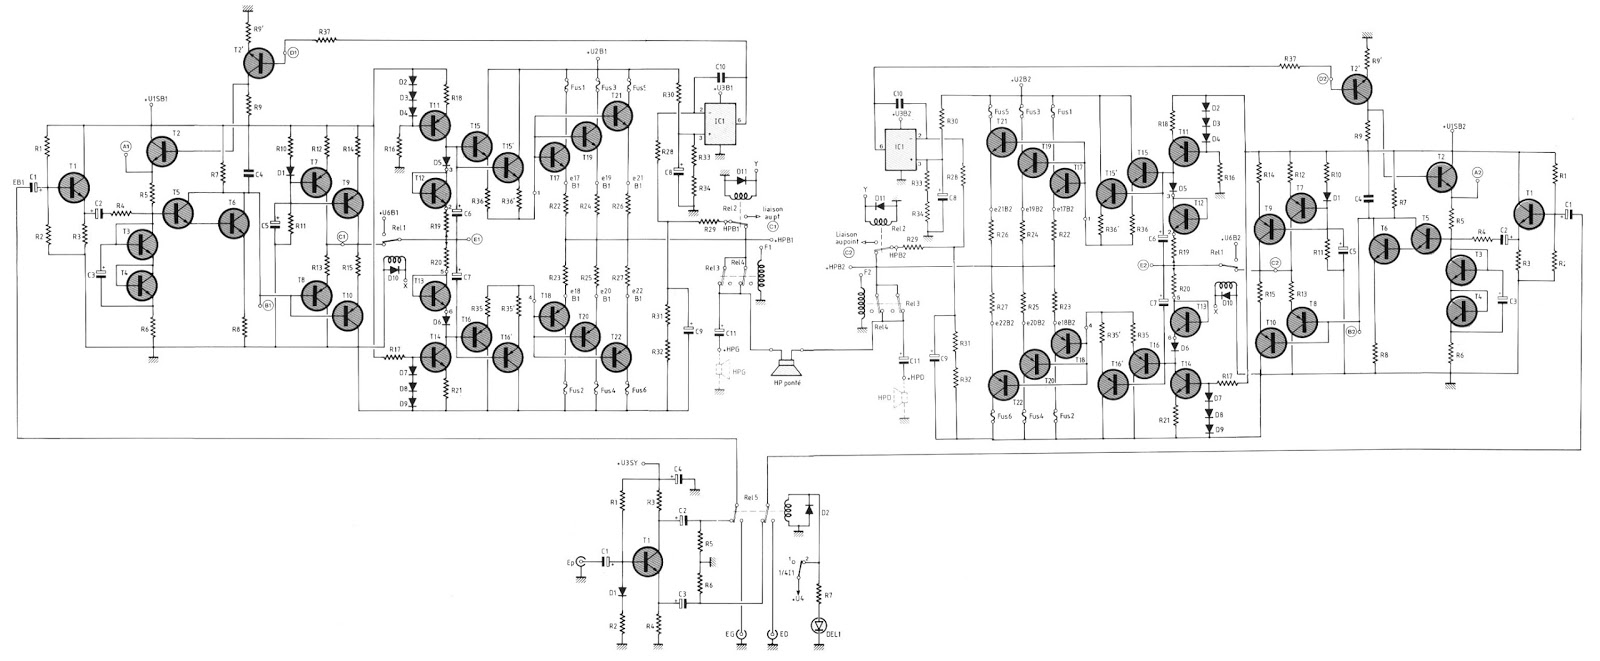 tibet sound system  1 kw power btl from prancis dan 5 kw